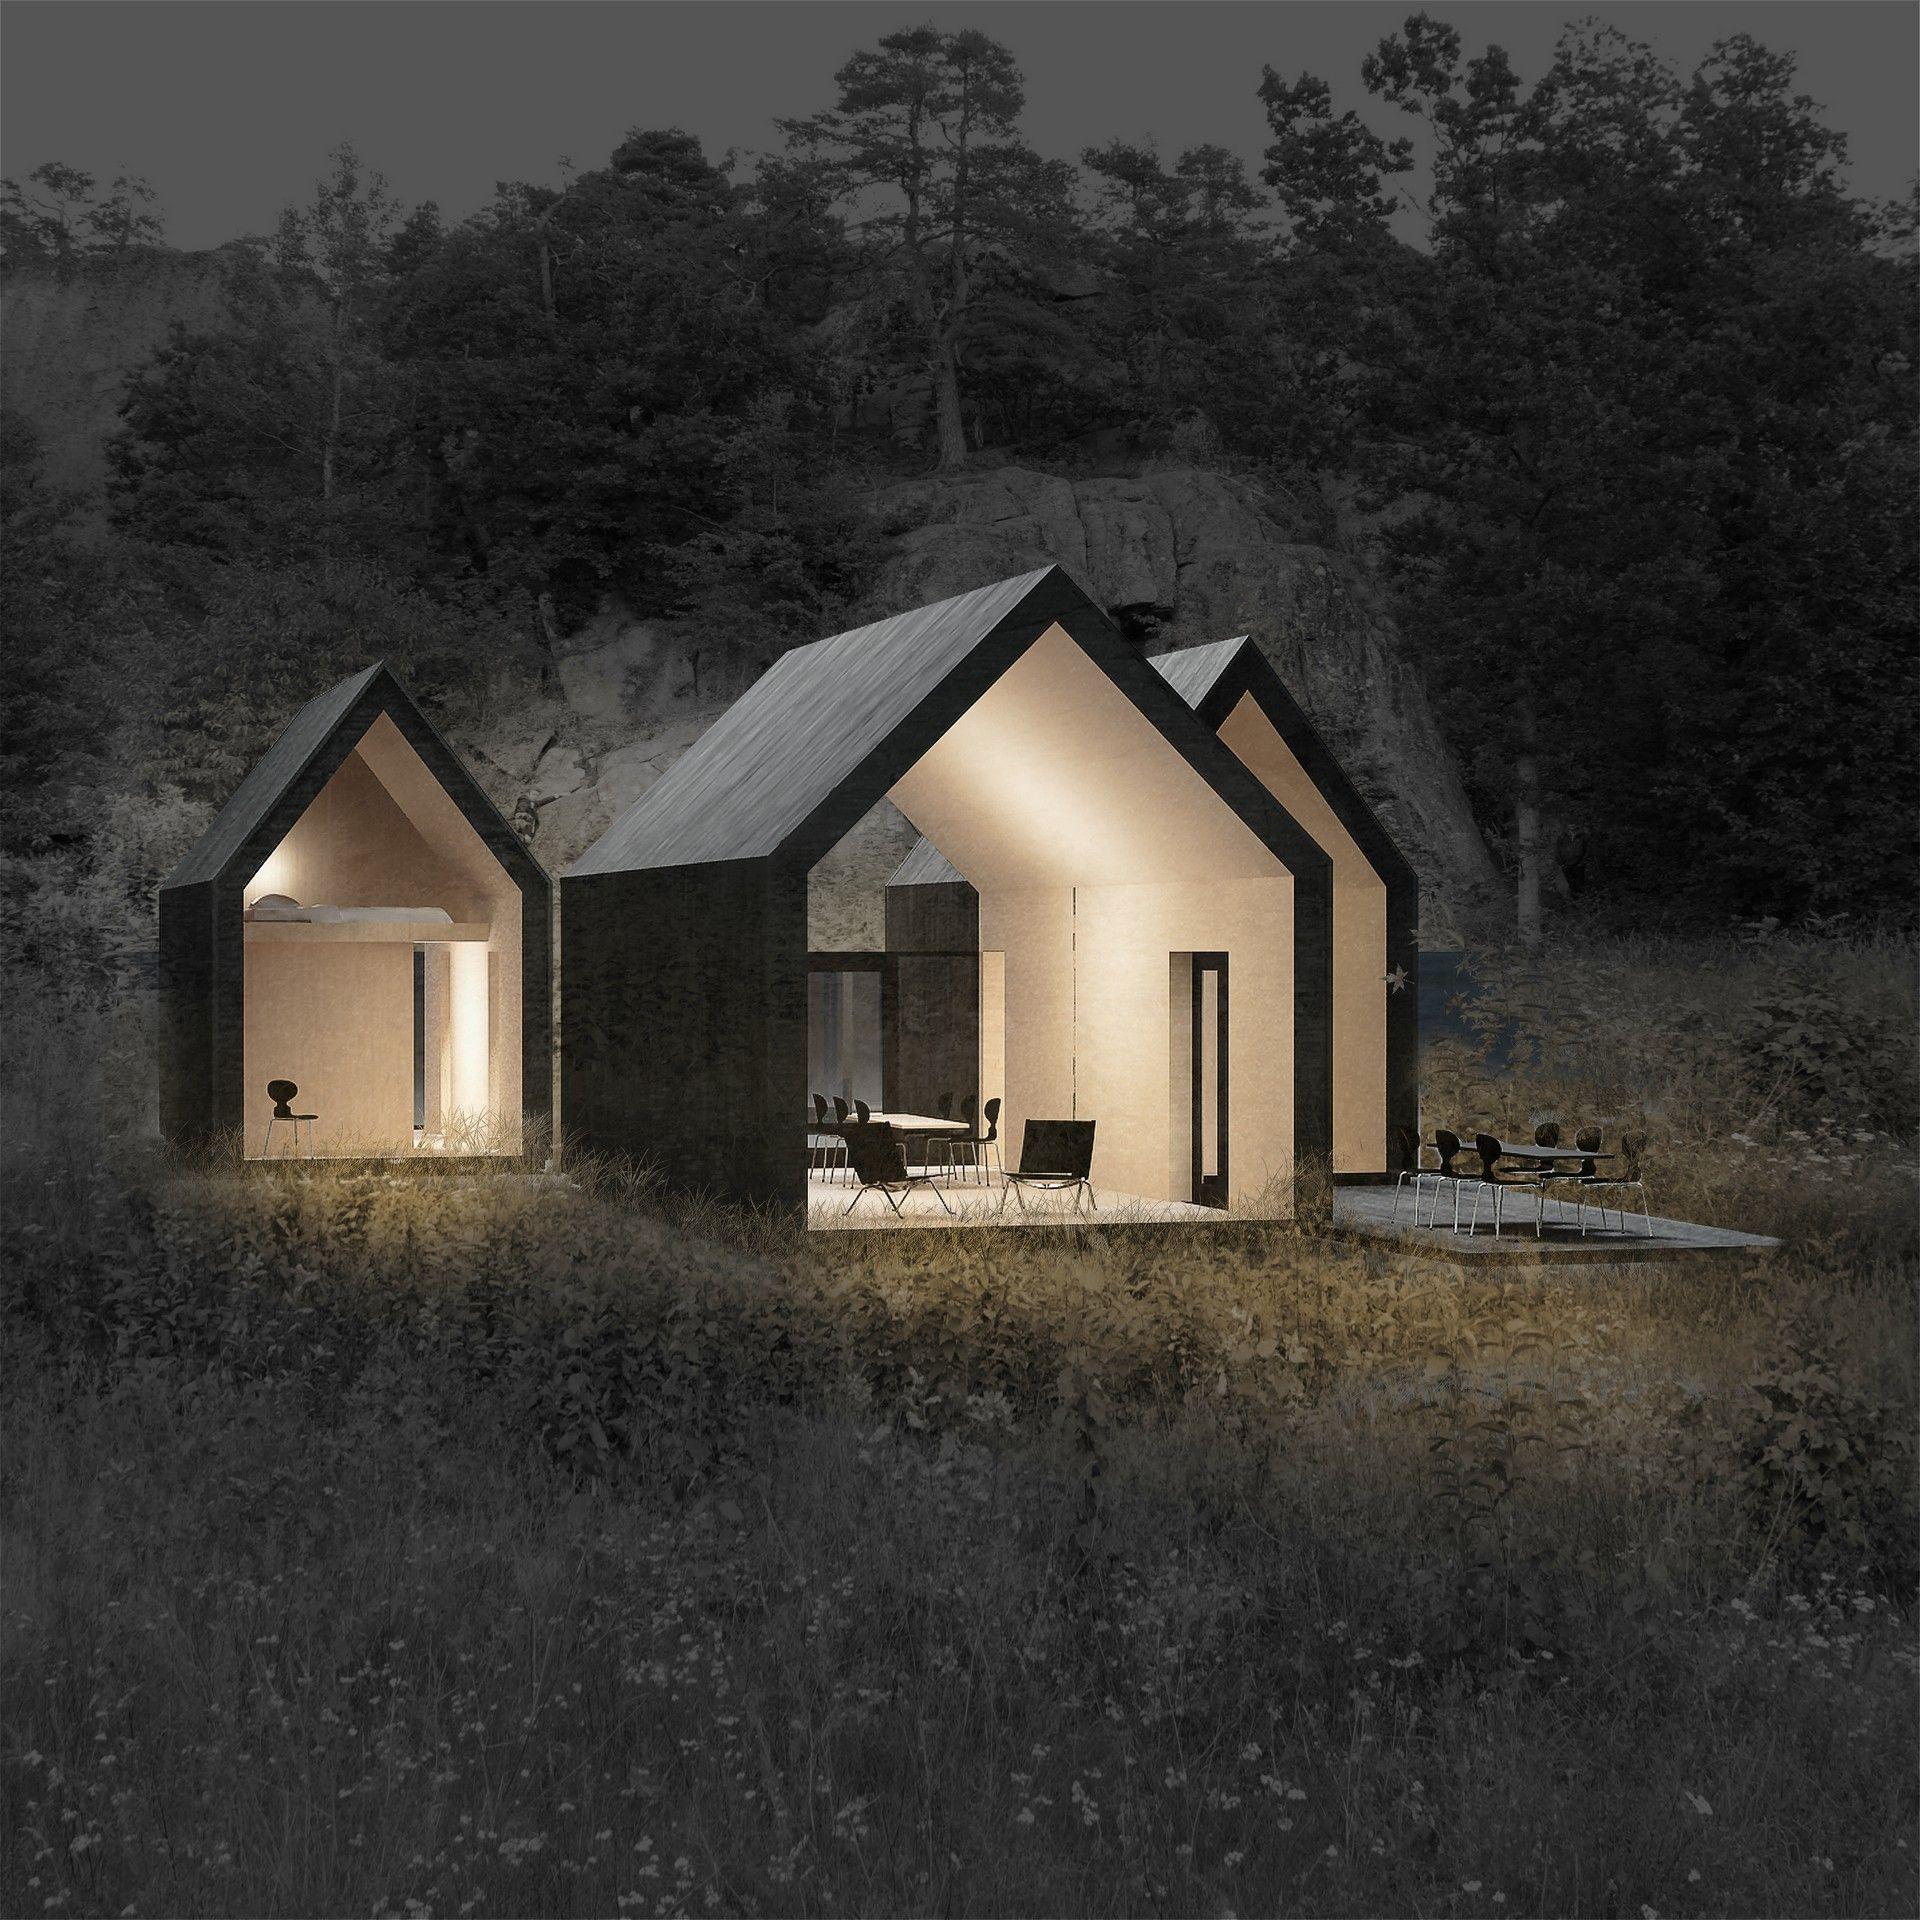 reiulf ramstad arkitekter project micro cluster cabins housz